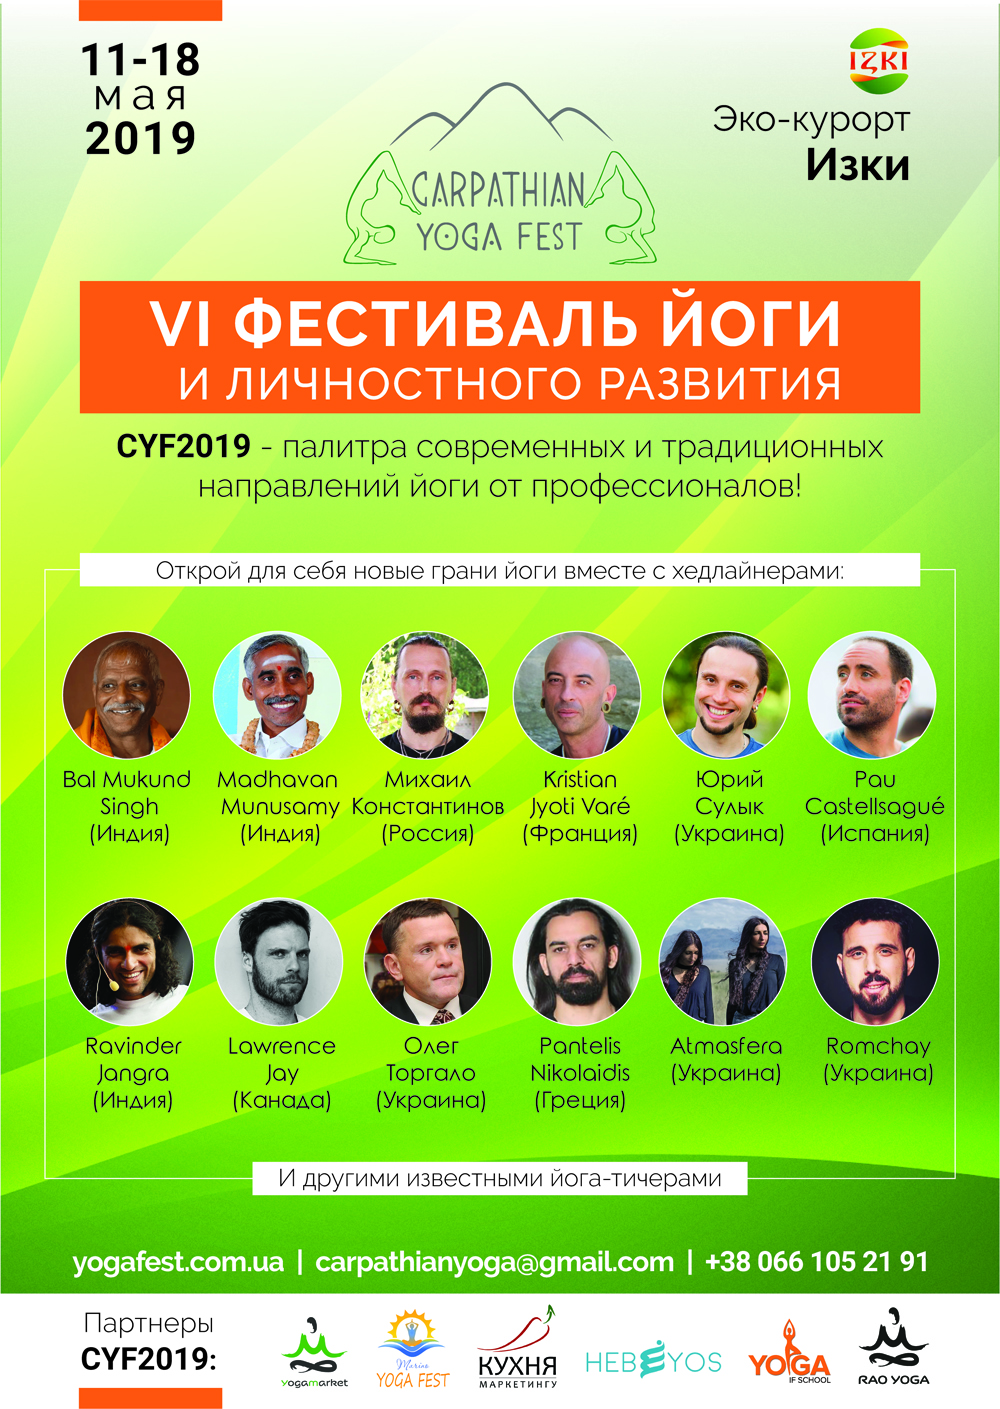 CYF_2019_rus